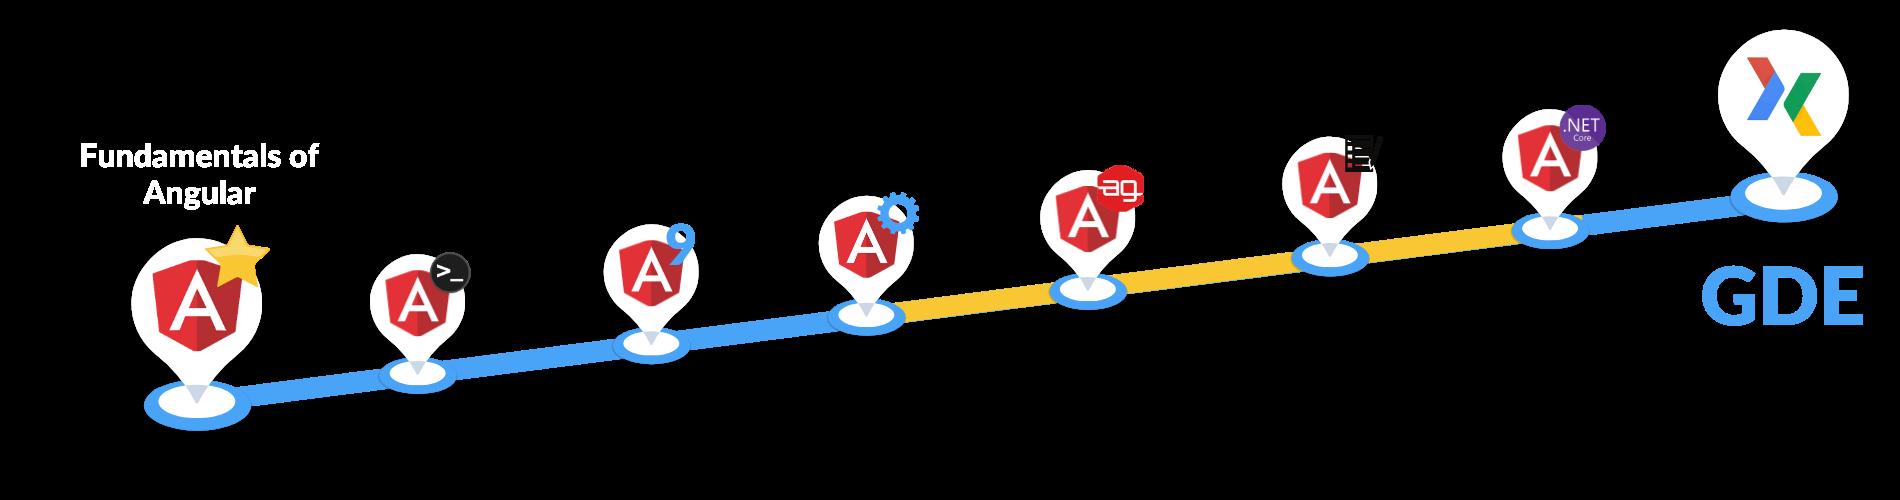 Google Developer Pathway